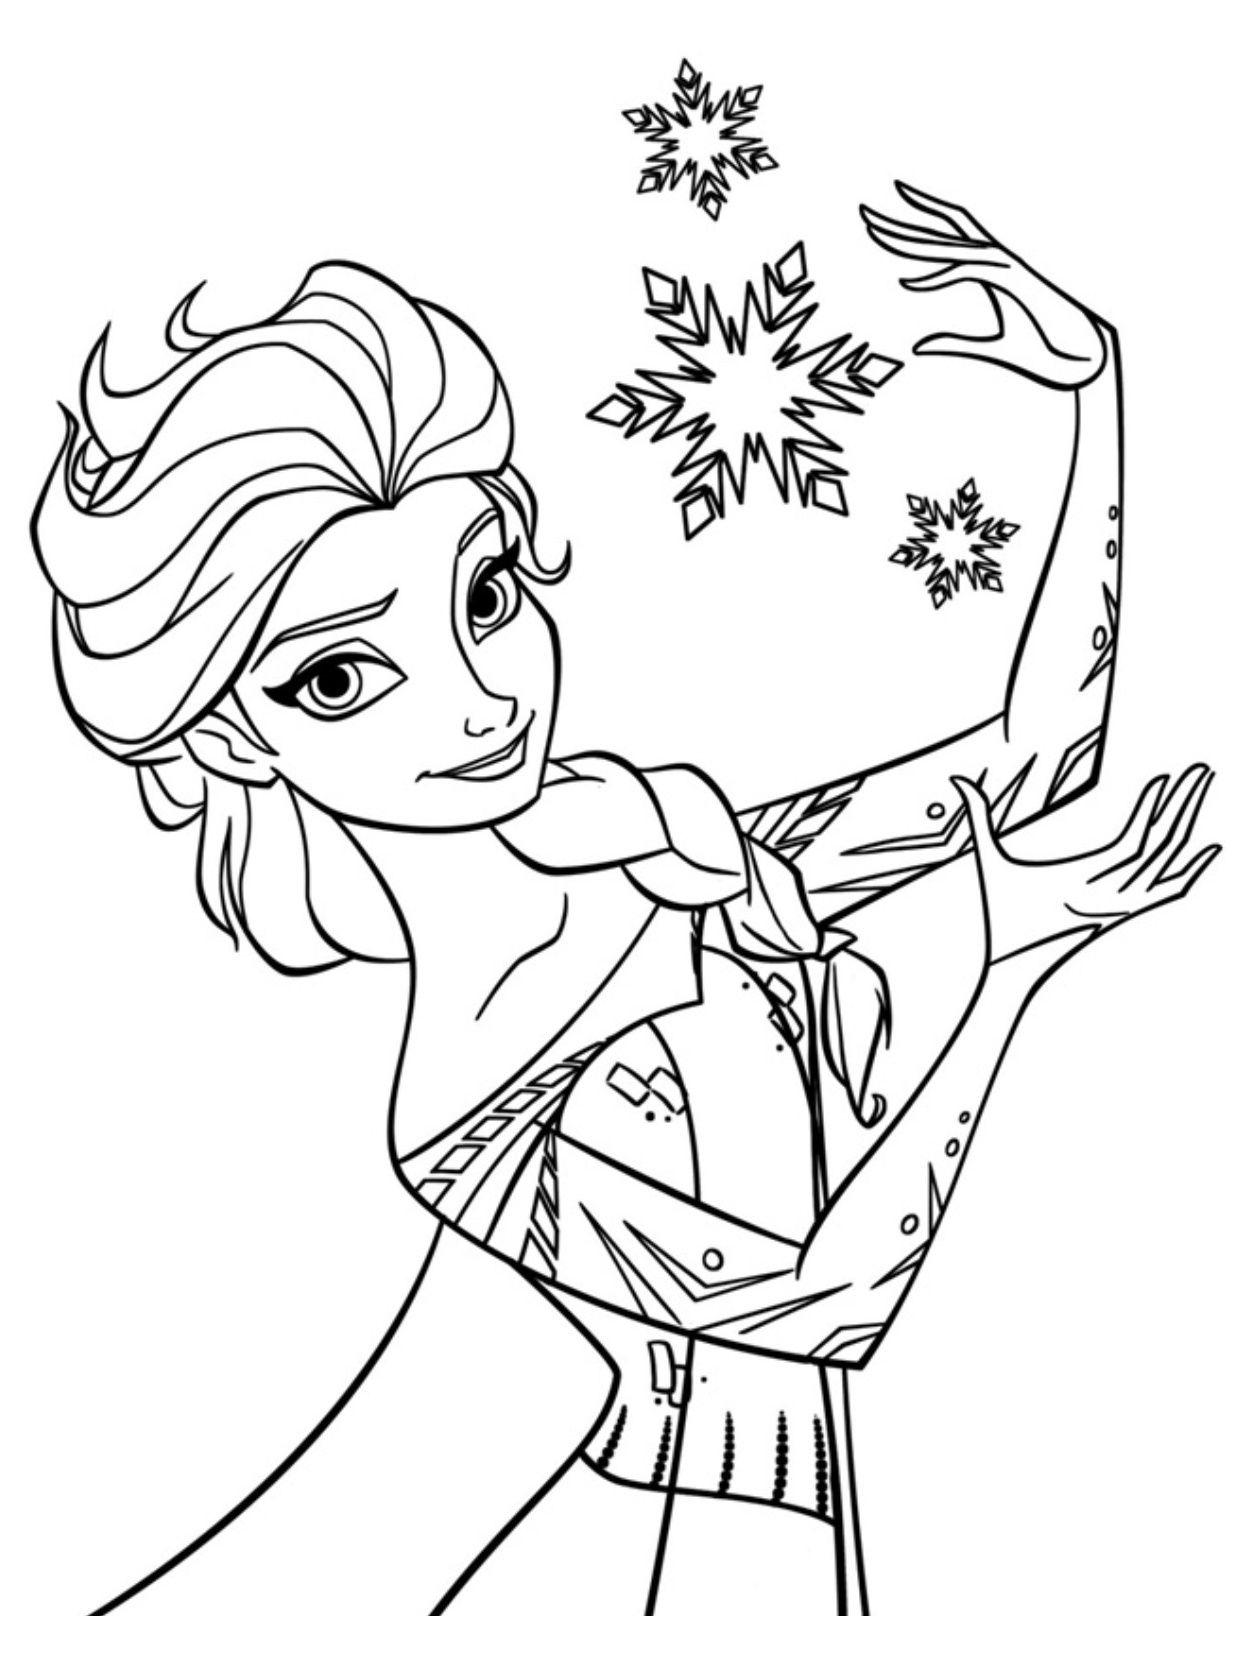 Omalovanky Ledove Kralovstvi I Creative Cz Inspirace Navody A Napady Pro Rodice Elsa Coloring Pages Disney Princess Coloring Pages Frozen Coloring Sheets